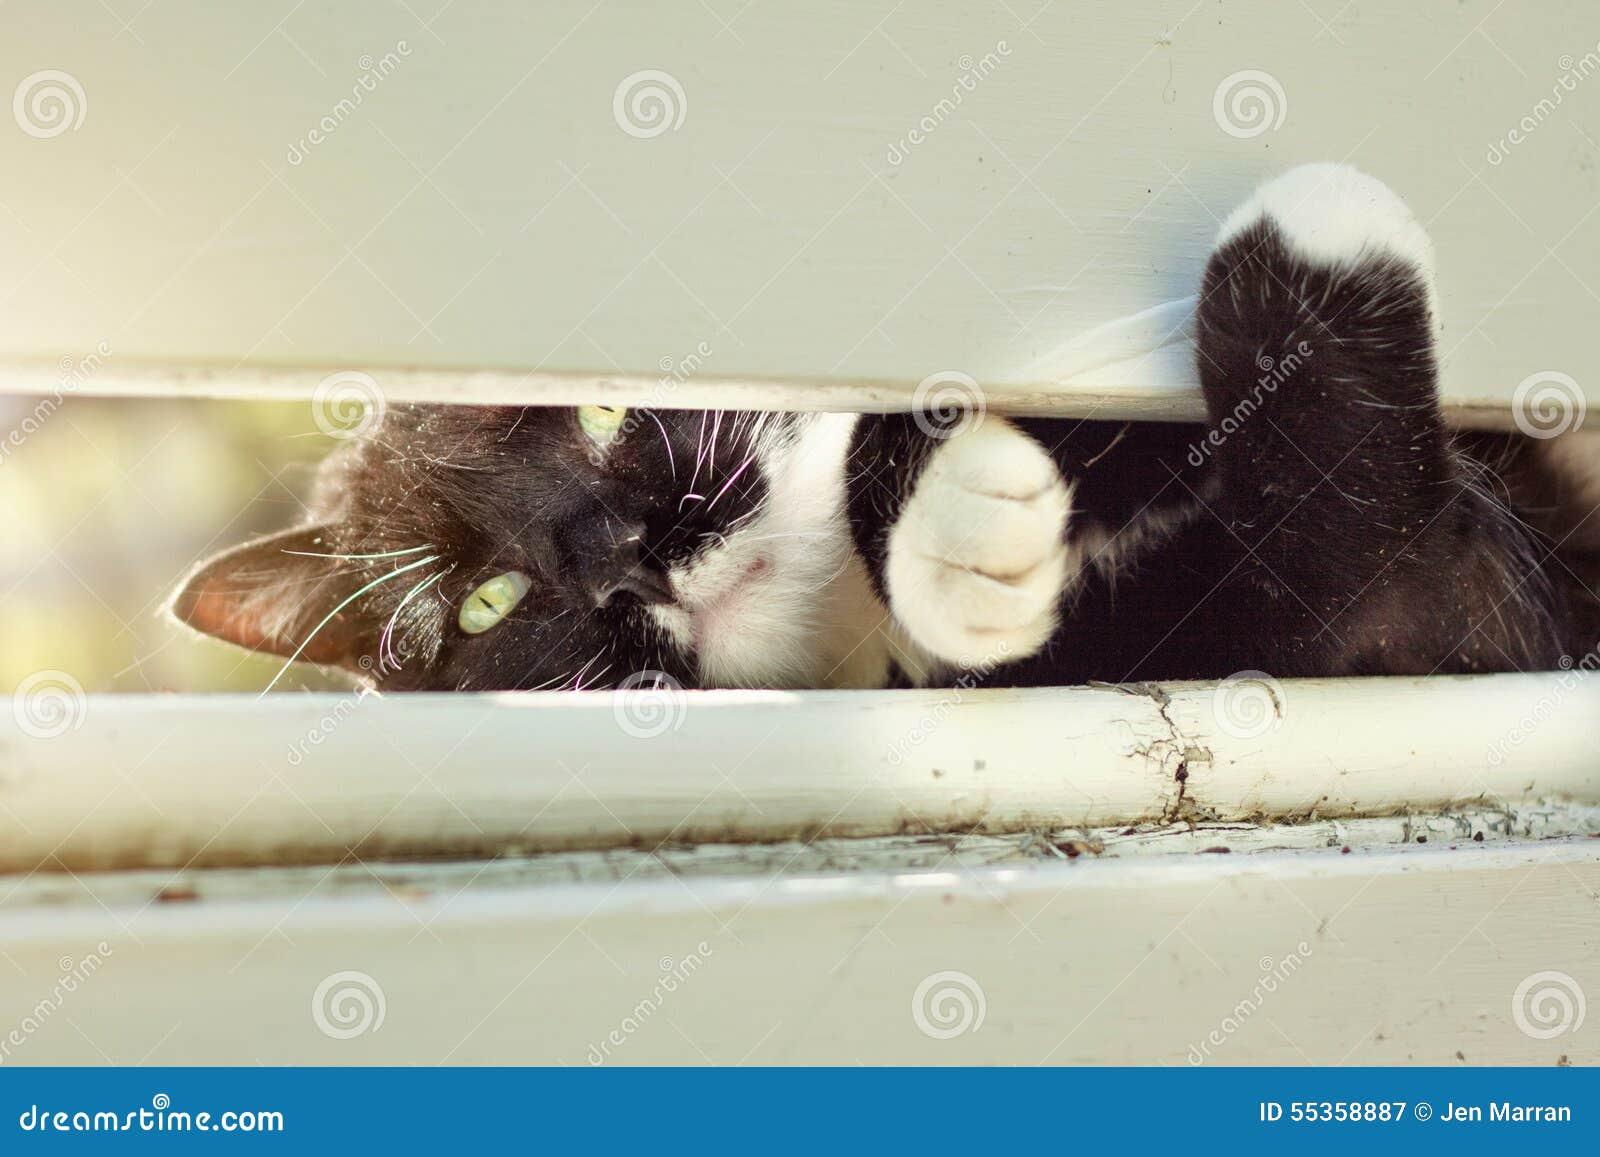 Cat Peeking Through Fence in bianco e nero